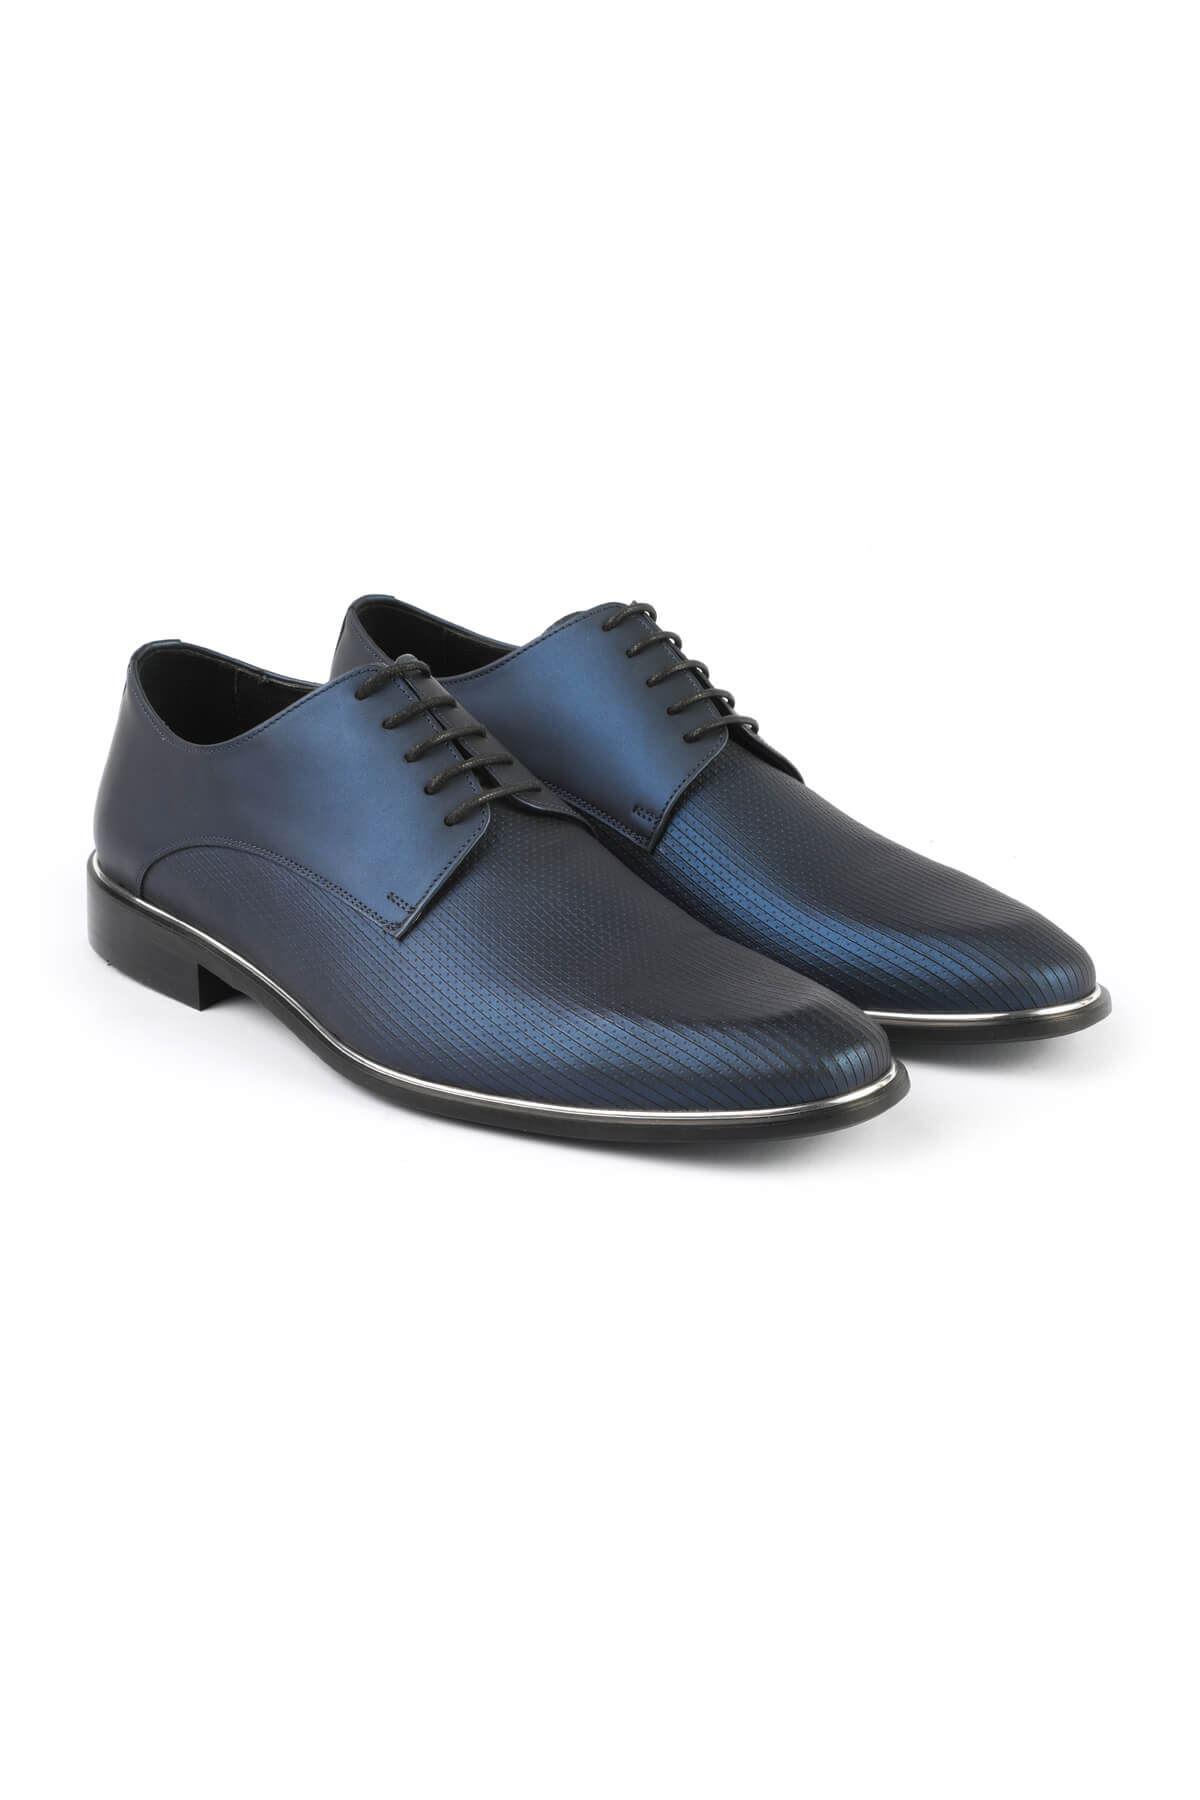 Libero 2982 Navy Blue Classic Shoes